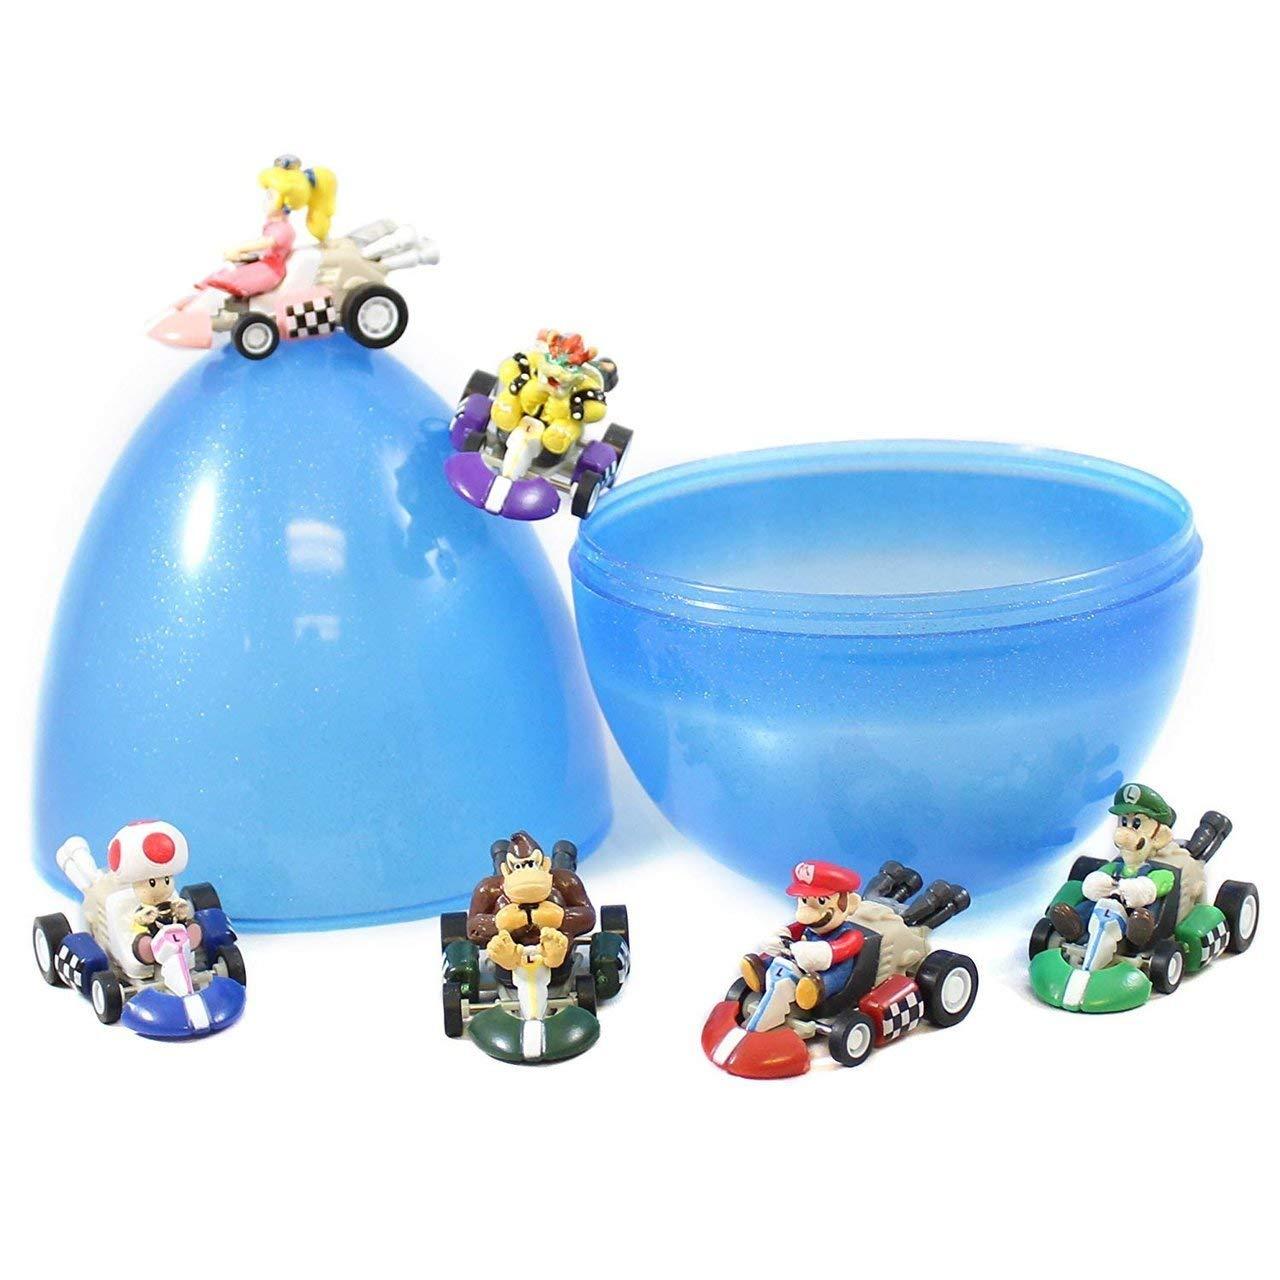 Coolinko 6 Mario Kart Pull Back Cars 2 Inch PVC Toys with 6'' Jumbo Plastic Easter Egg Hunt Party Favor